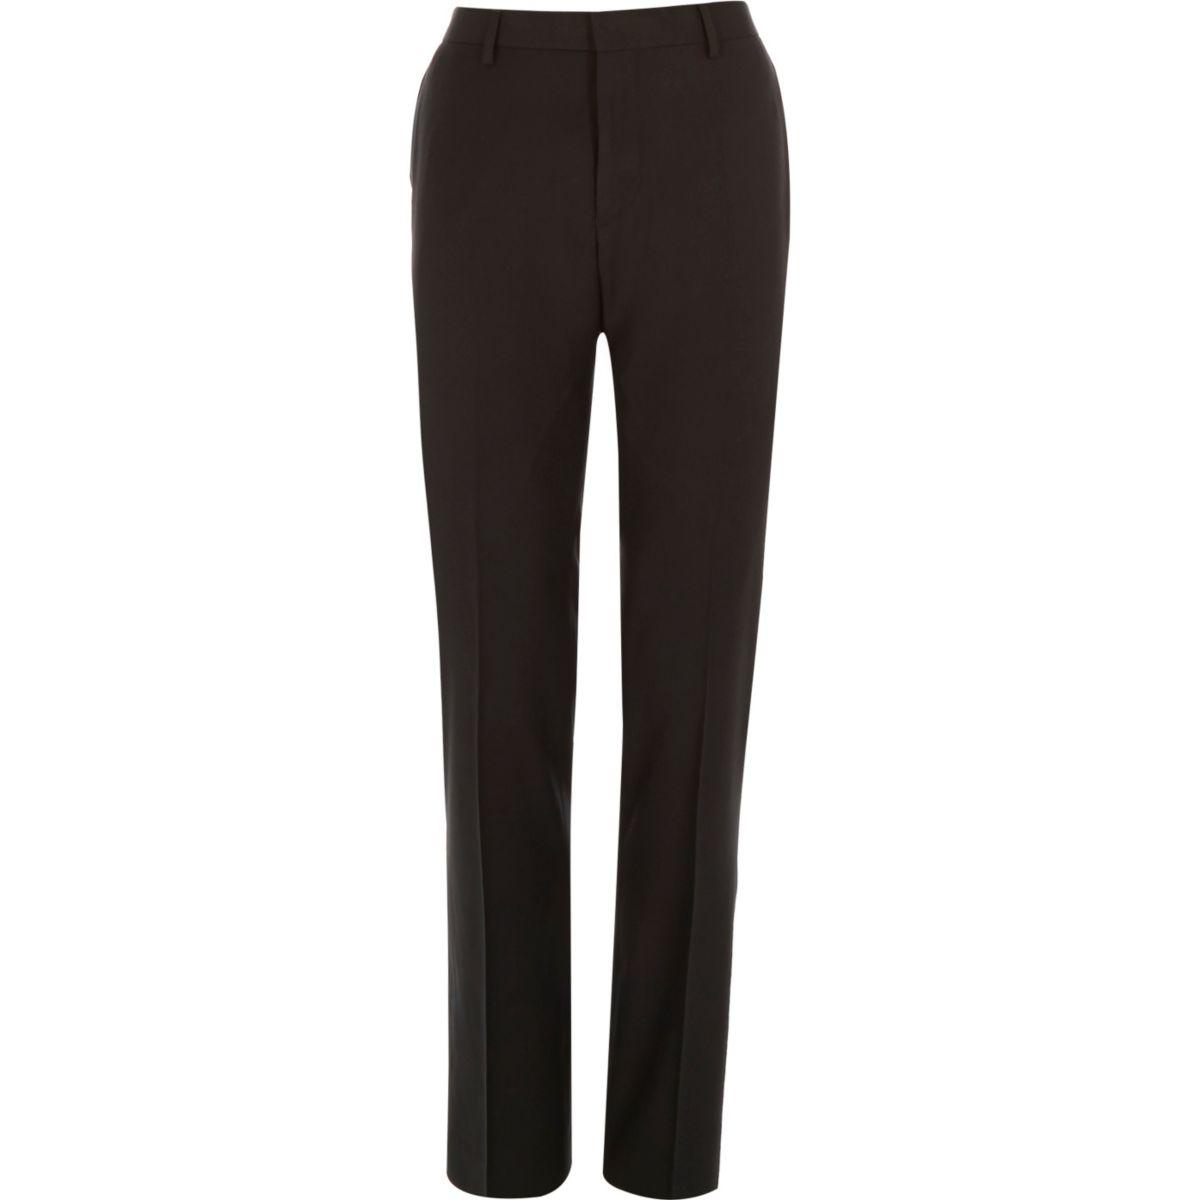 Darkest grey slim suit trousers